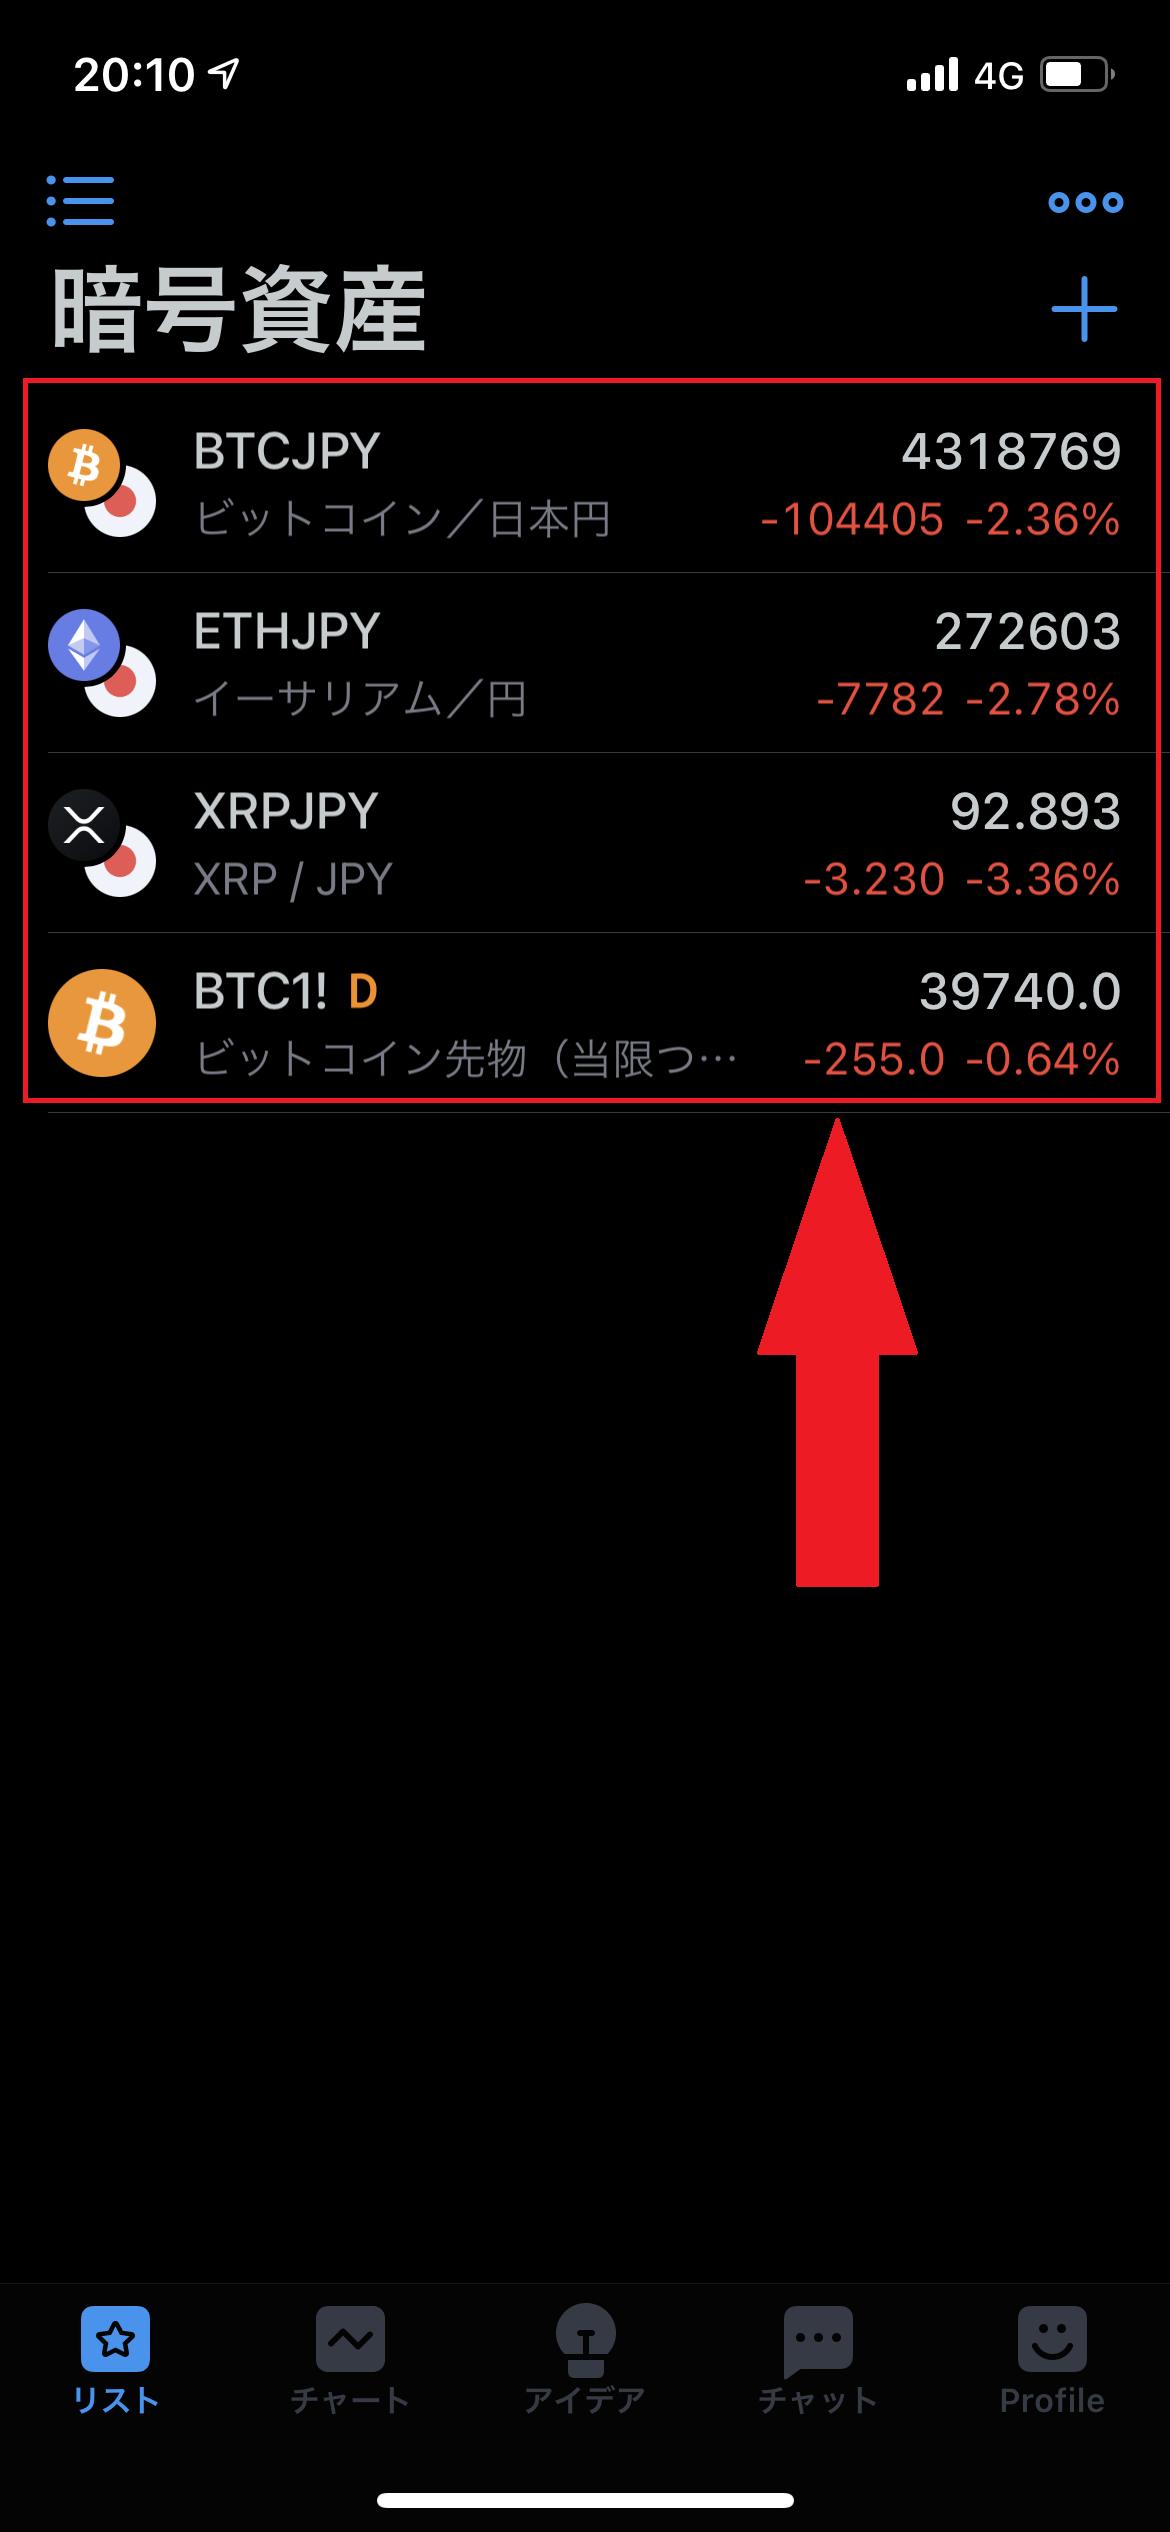 TradingViewに暗号資産のシンボル追加完了のスクリーンショット